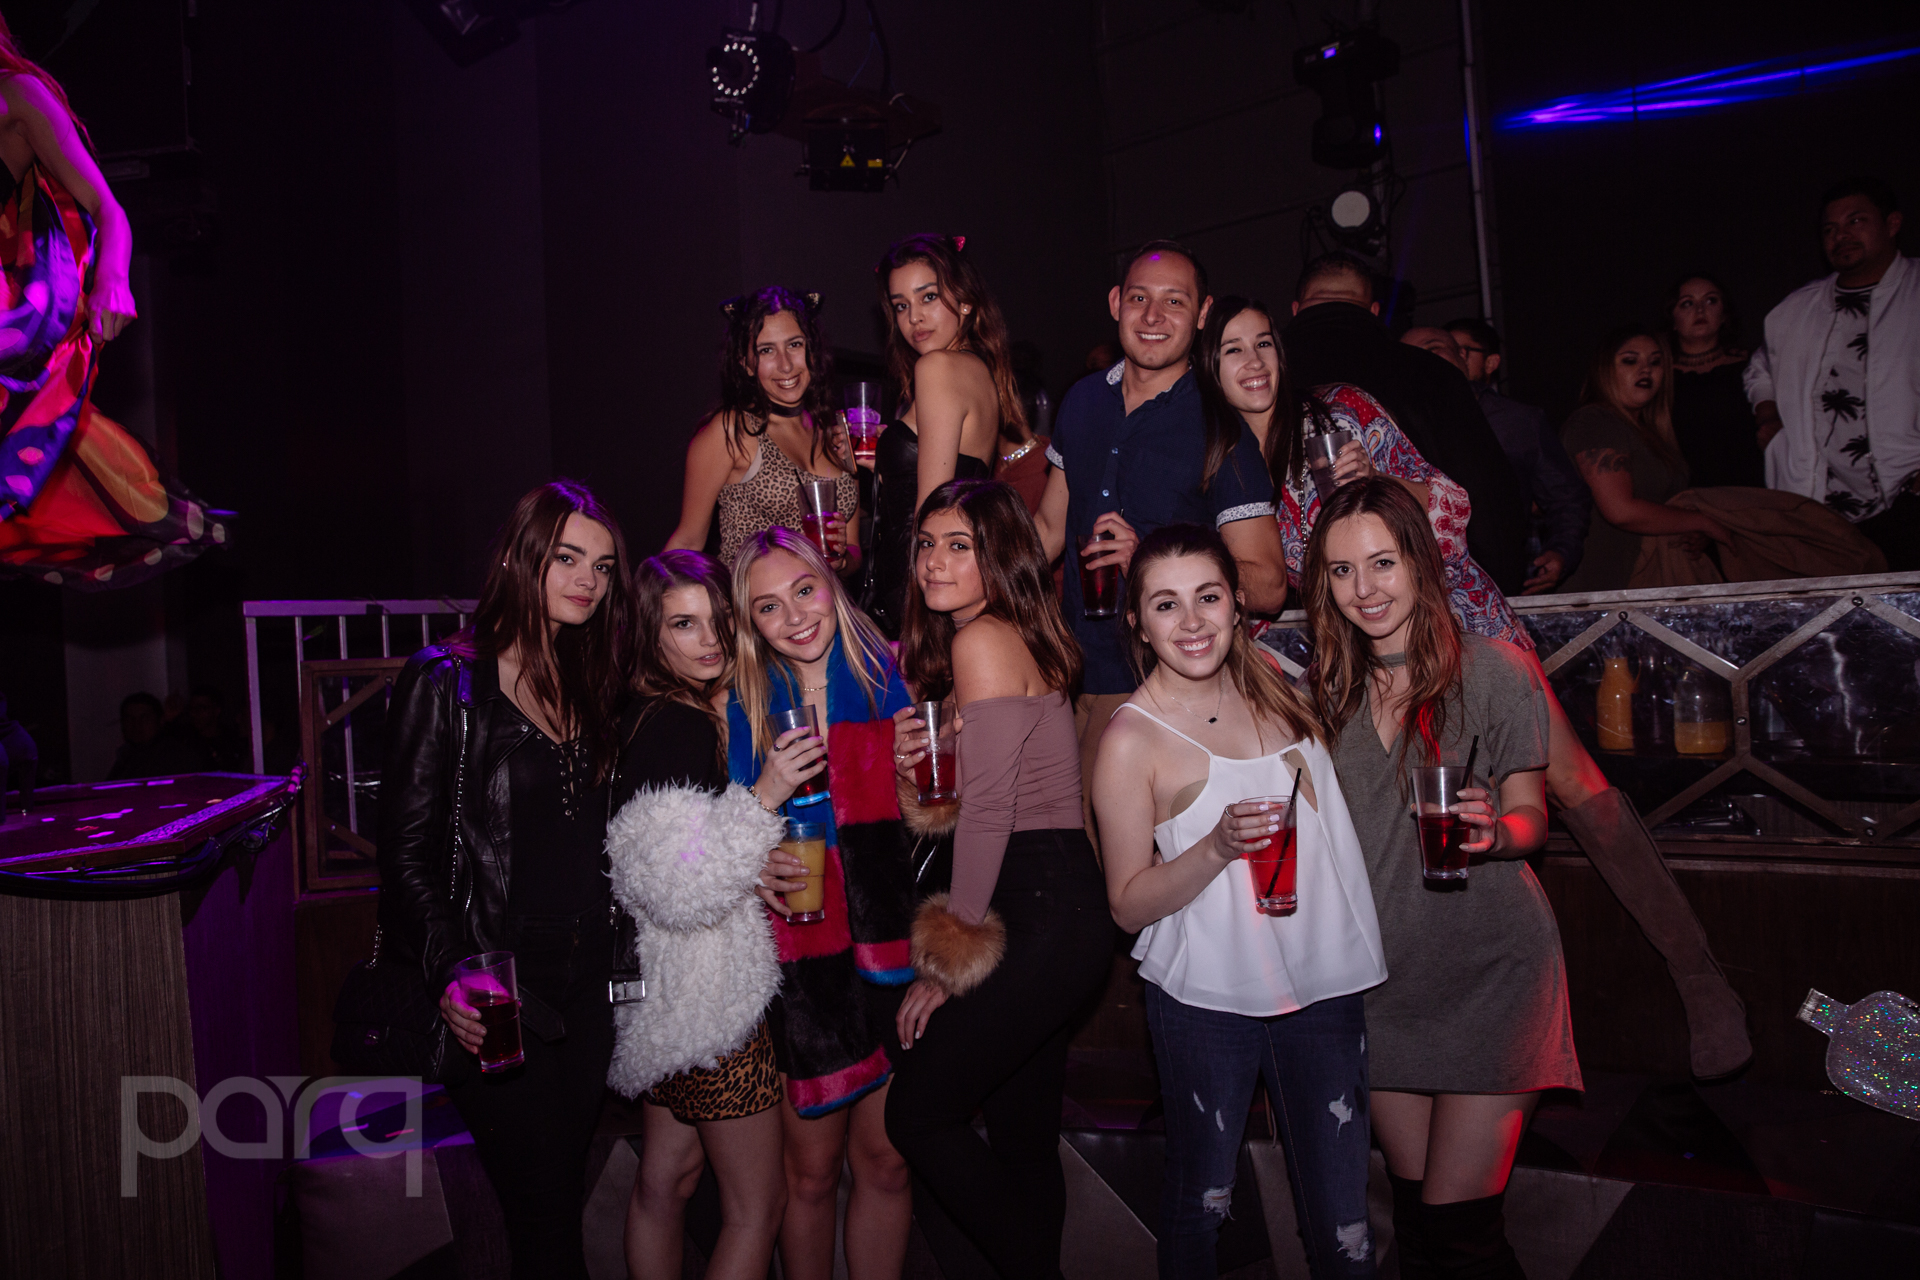 San-Diego-Nightclub-Zoo Funktion-13.jpg